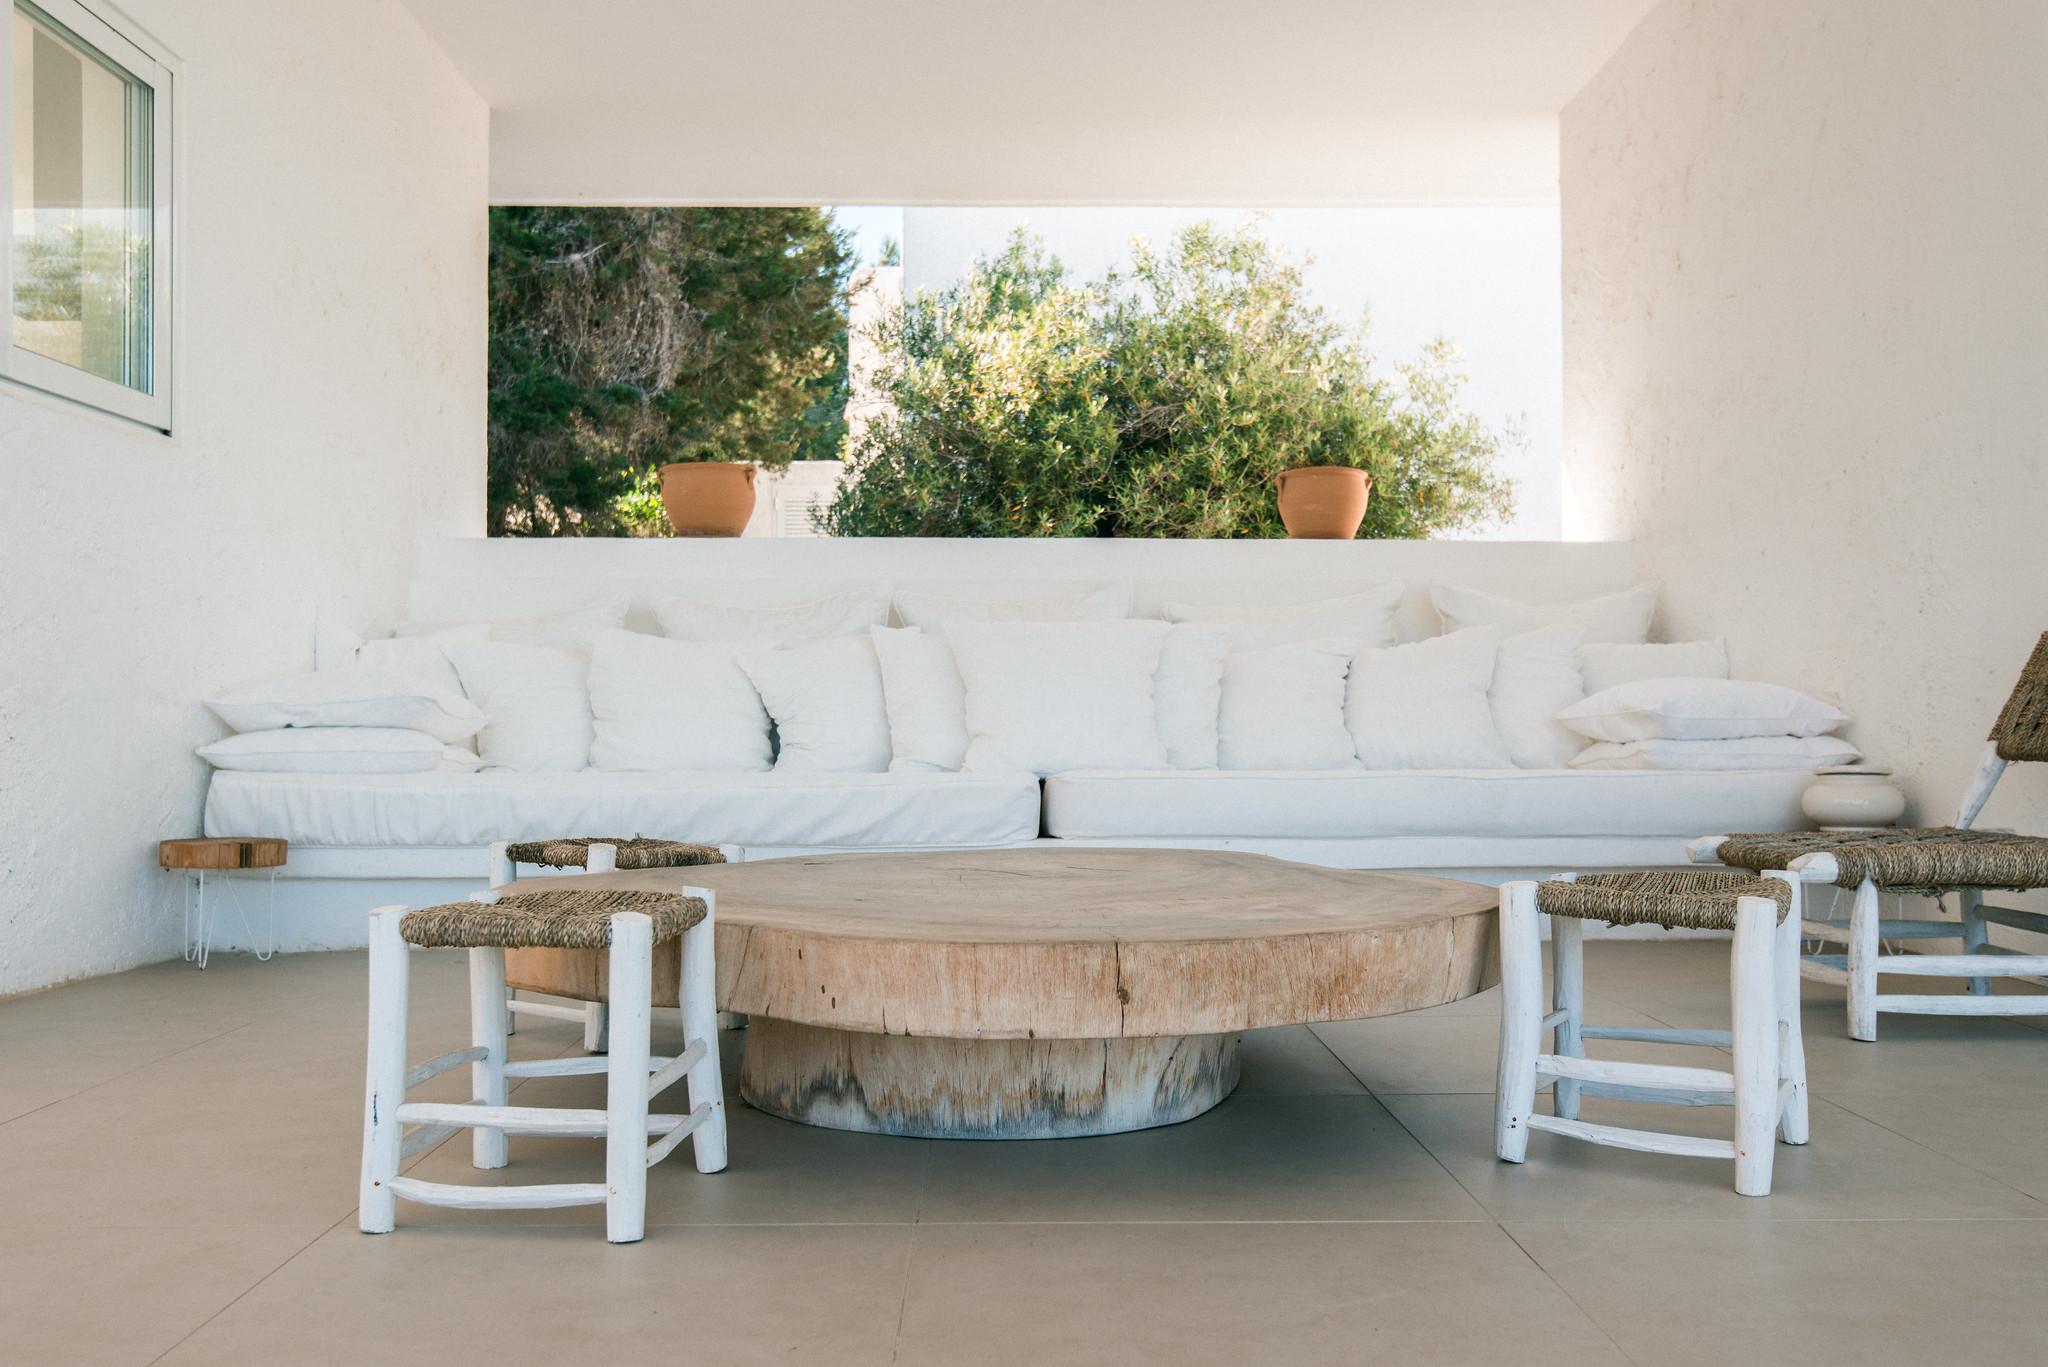 https://www.white-ibiza.com/wp-content/uploads/2020/06/white-ibiza-villas-casa-odette-exterior-seating-area.jpg